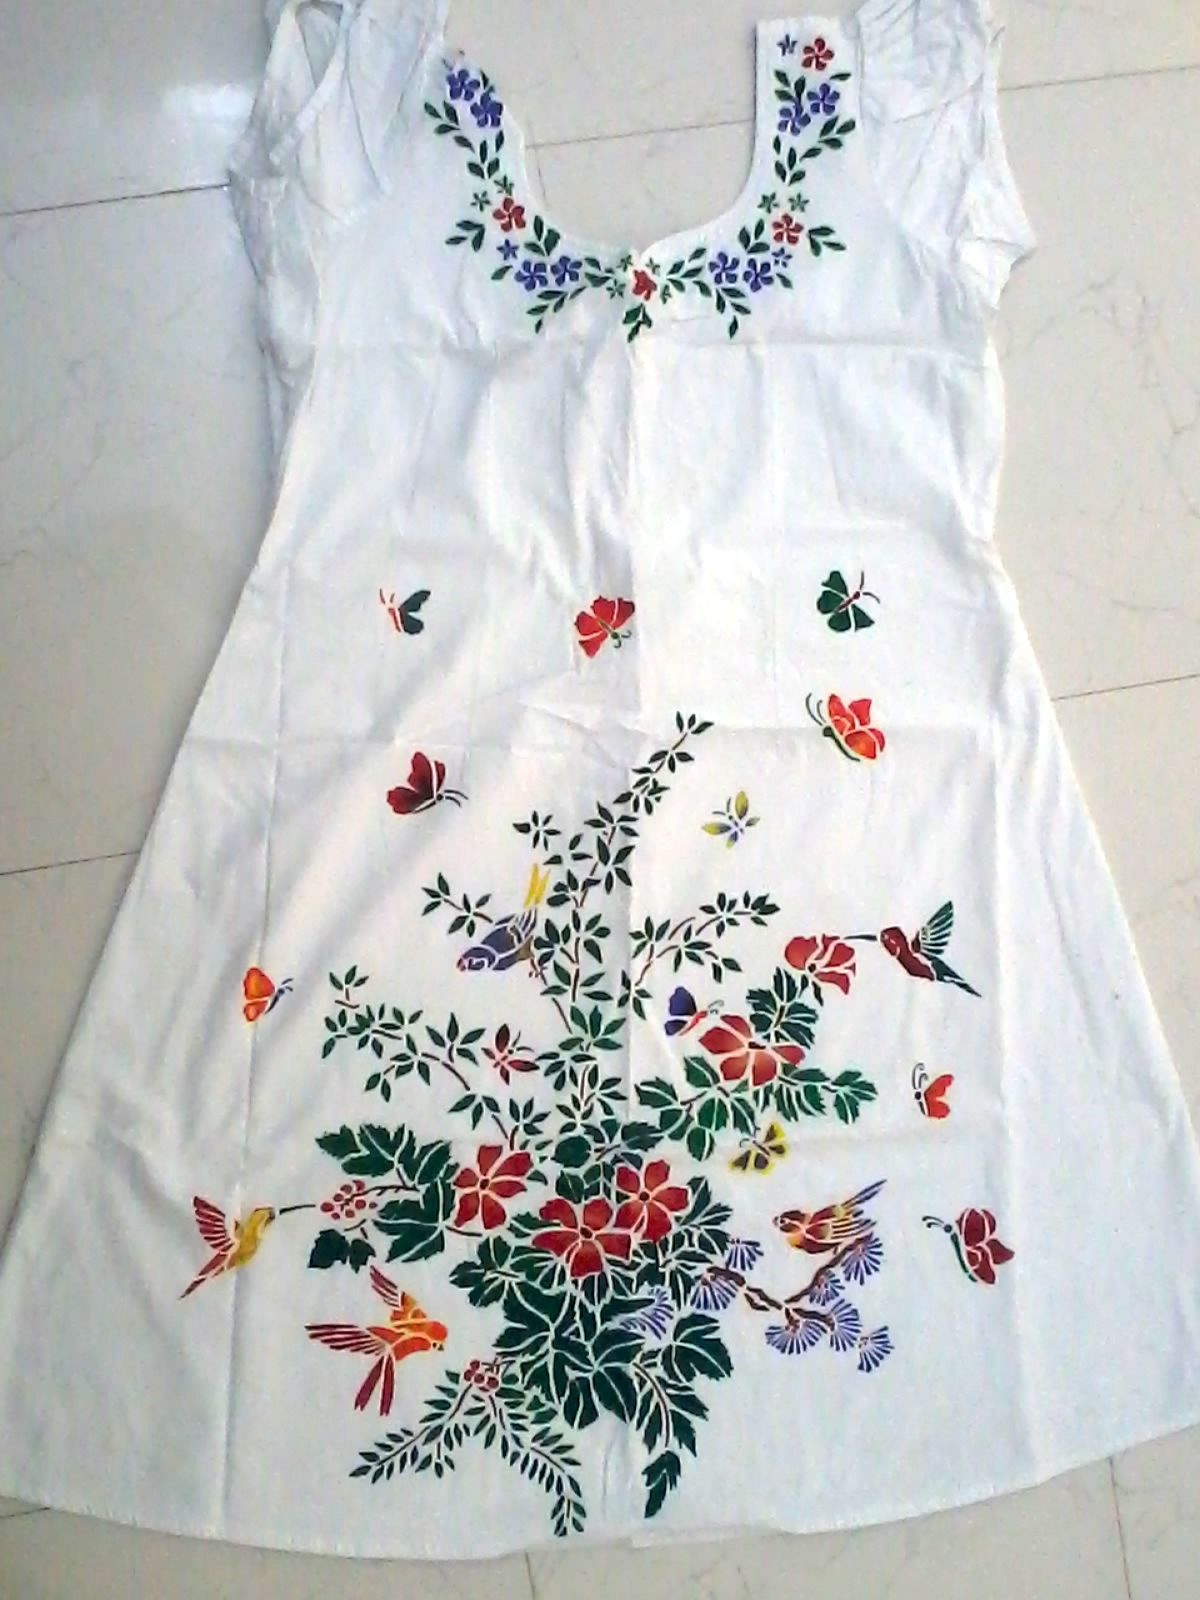 My Stencil Fabric Painting On Kurti